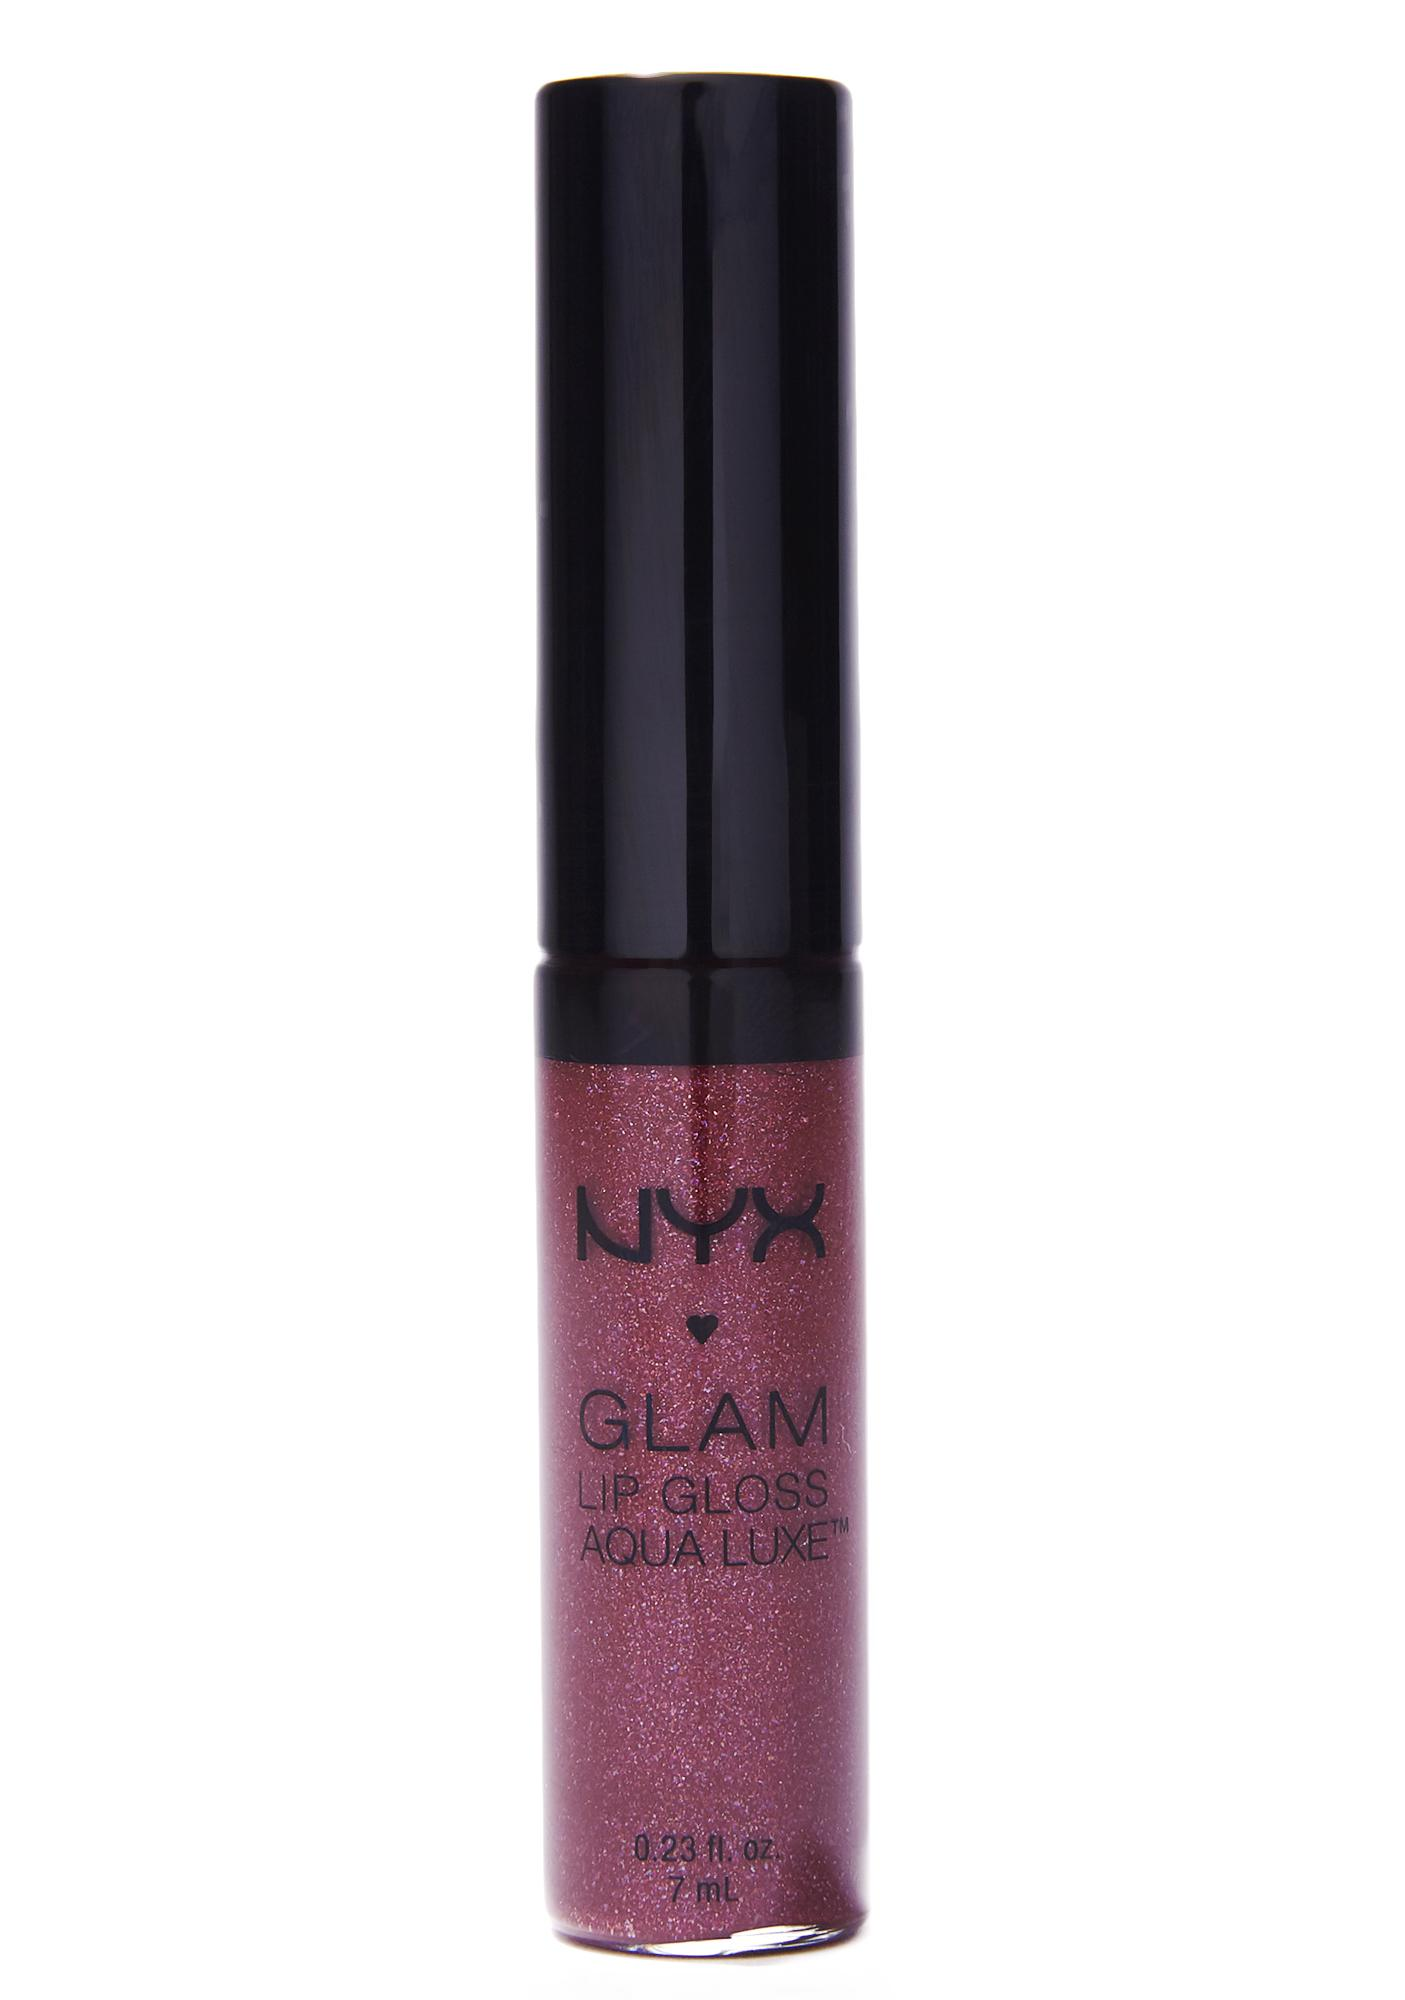 NYX Cool Cat Glam Lip Gloss